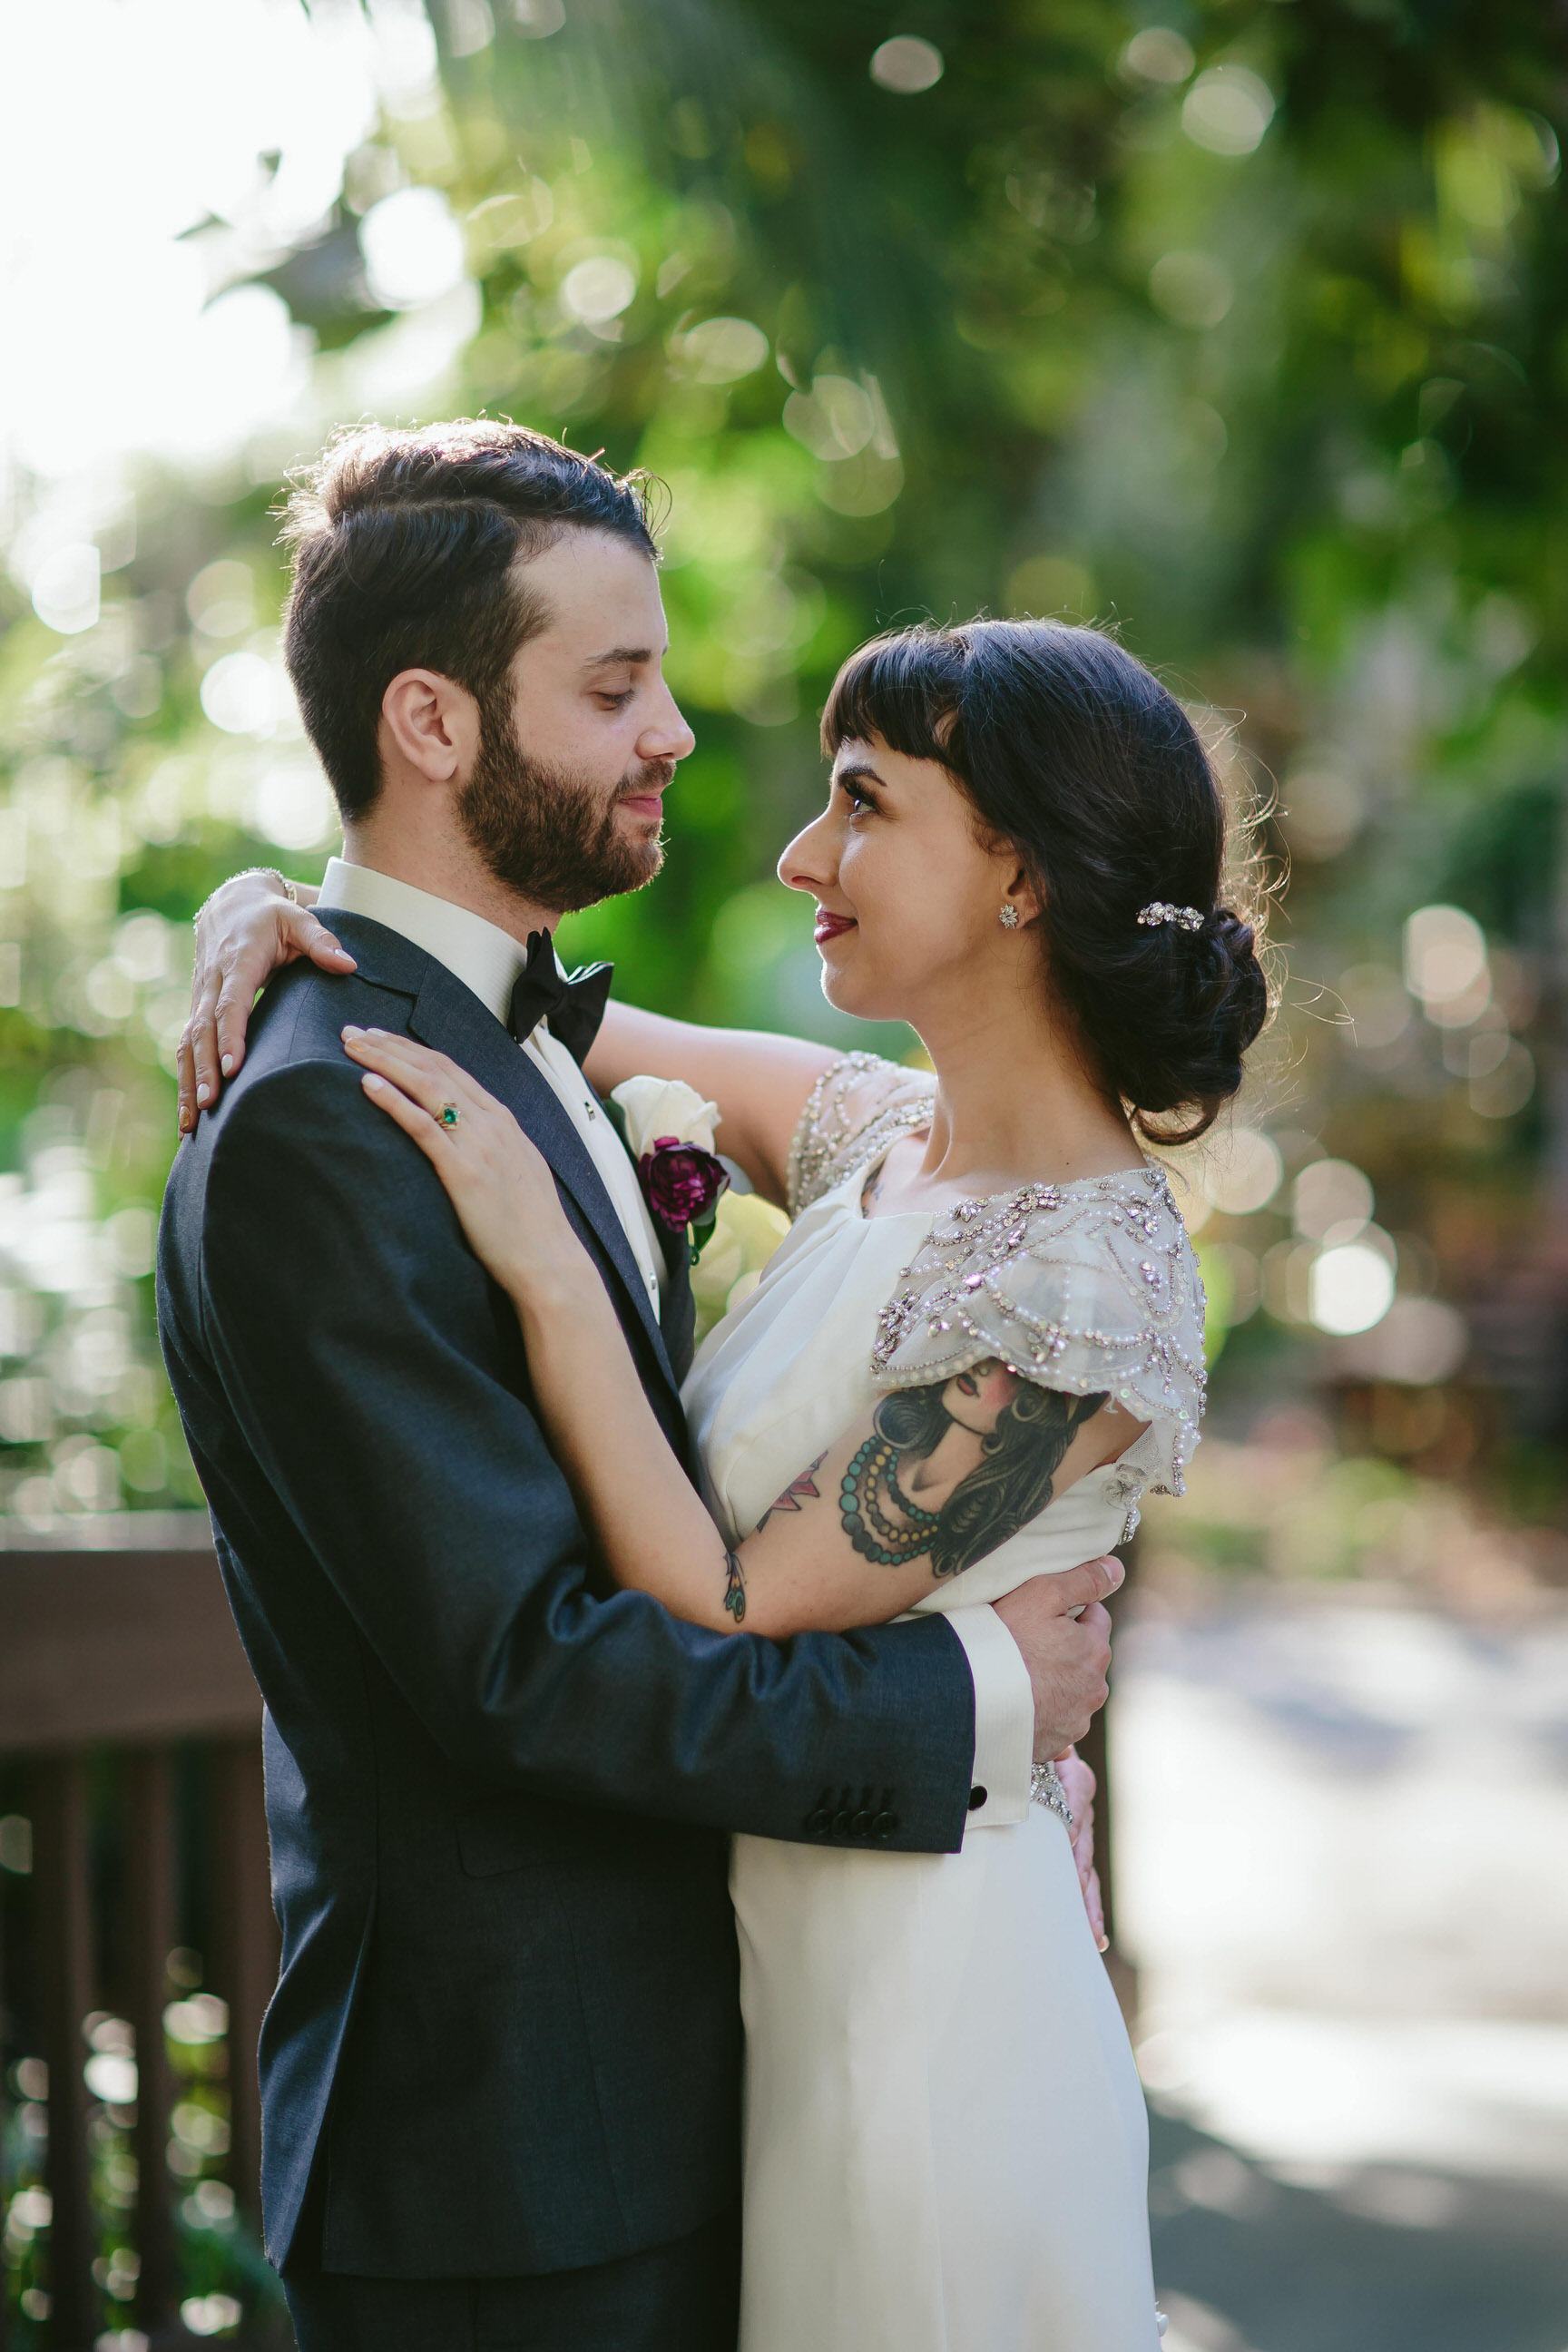 classic wedding photography timeless beautiful